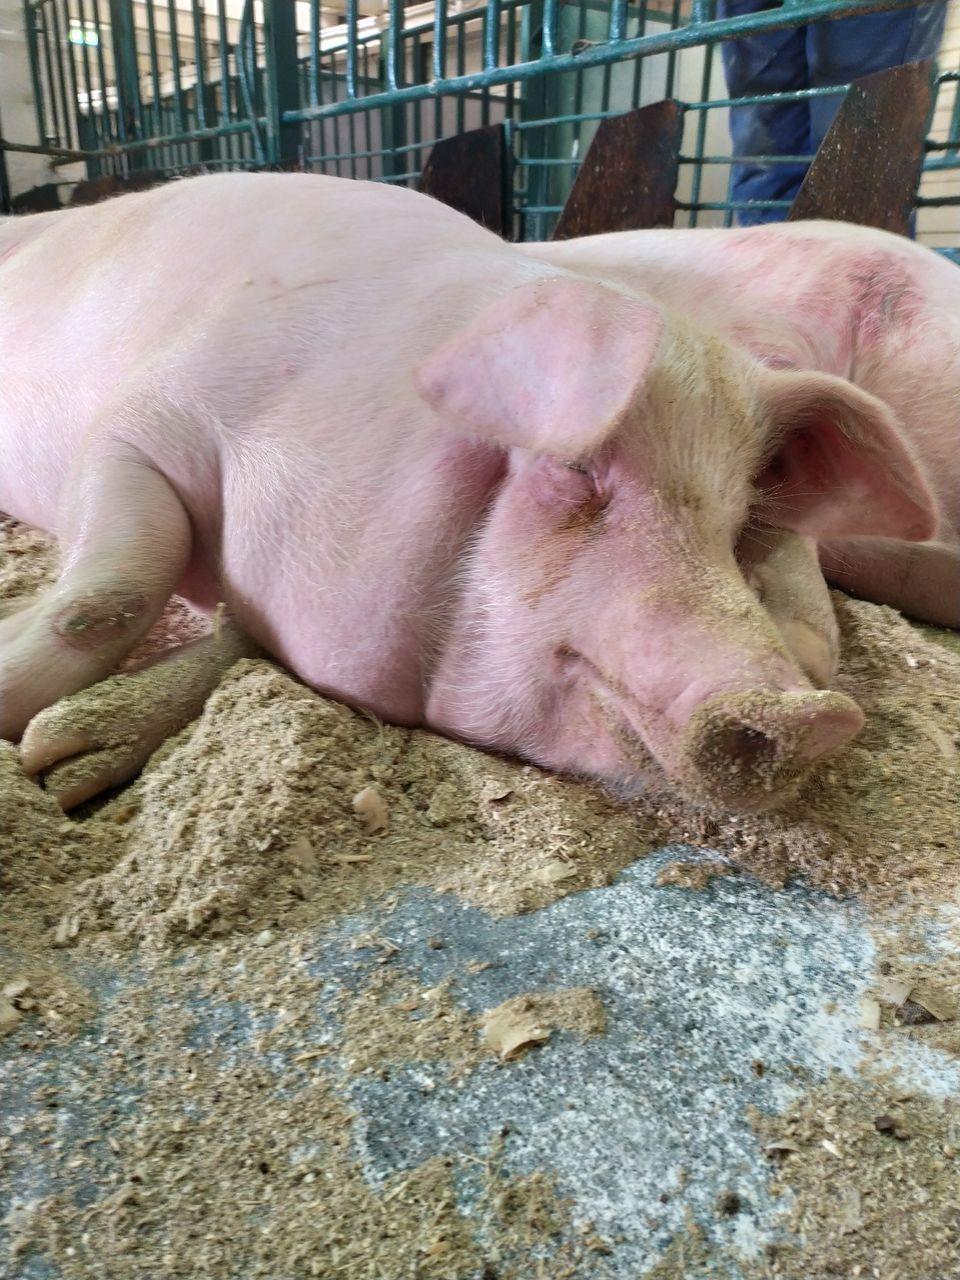 CLOSE-UP OF ANIMAL SLEEPING ON CARPET